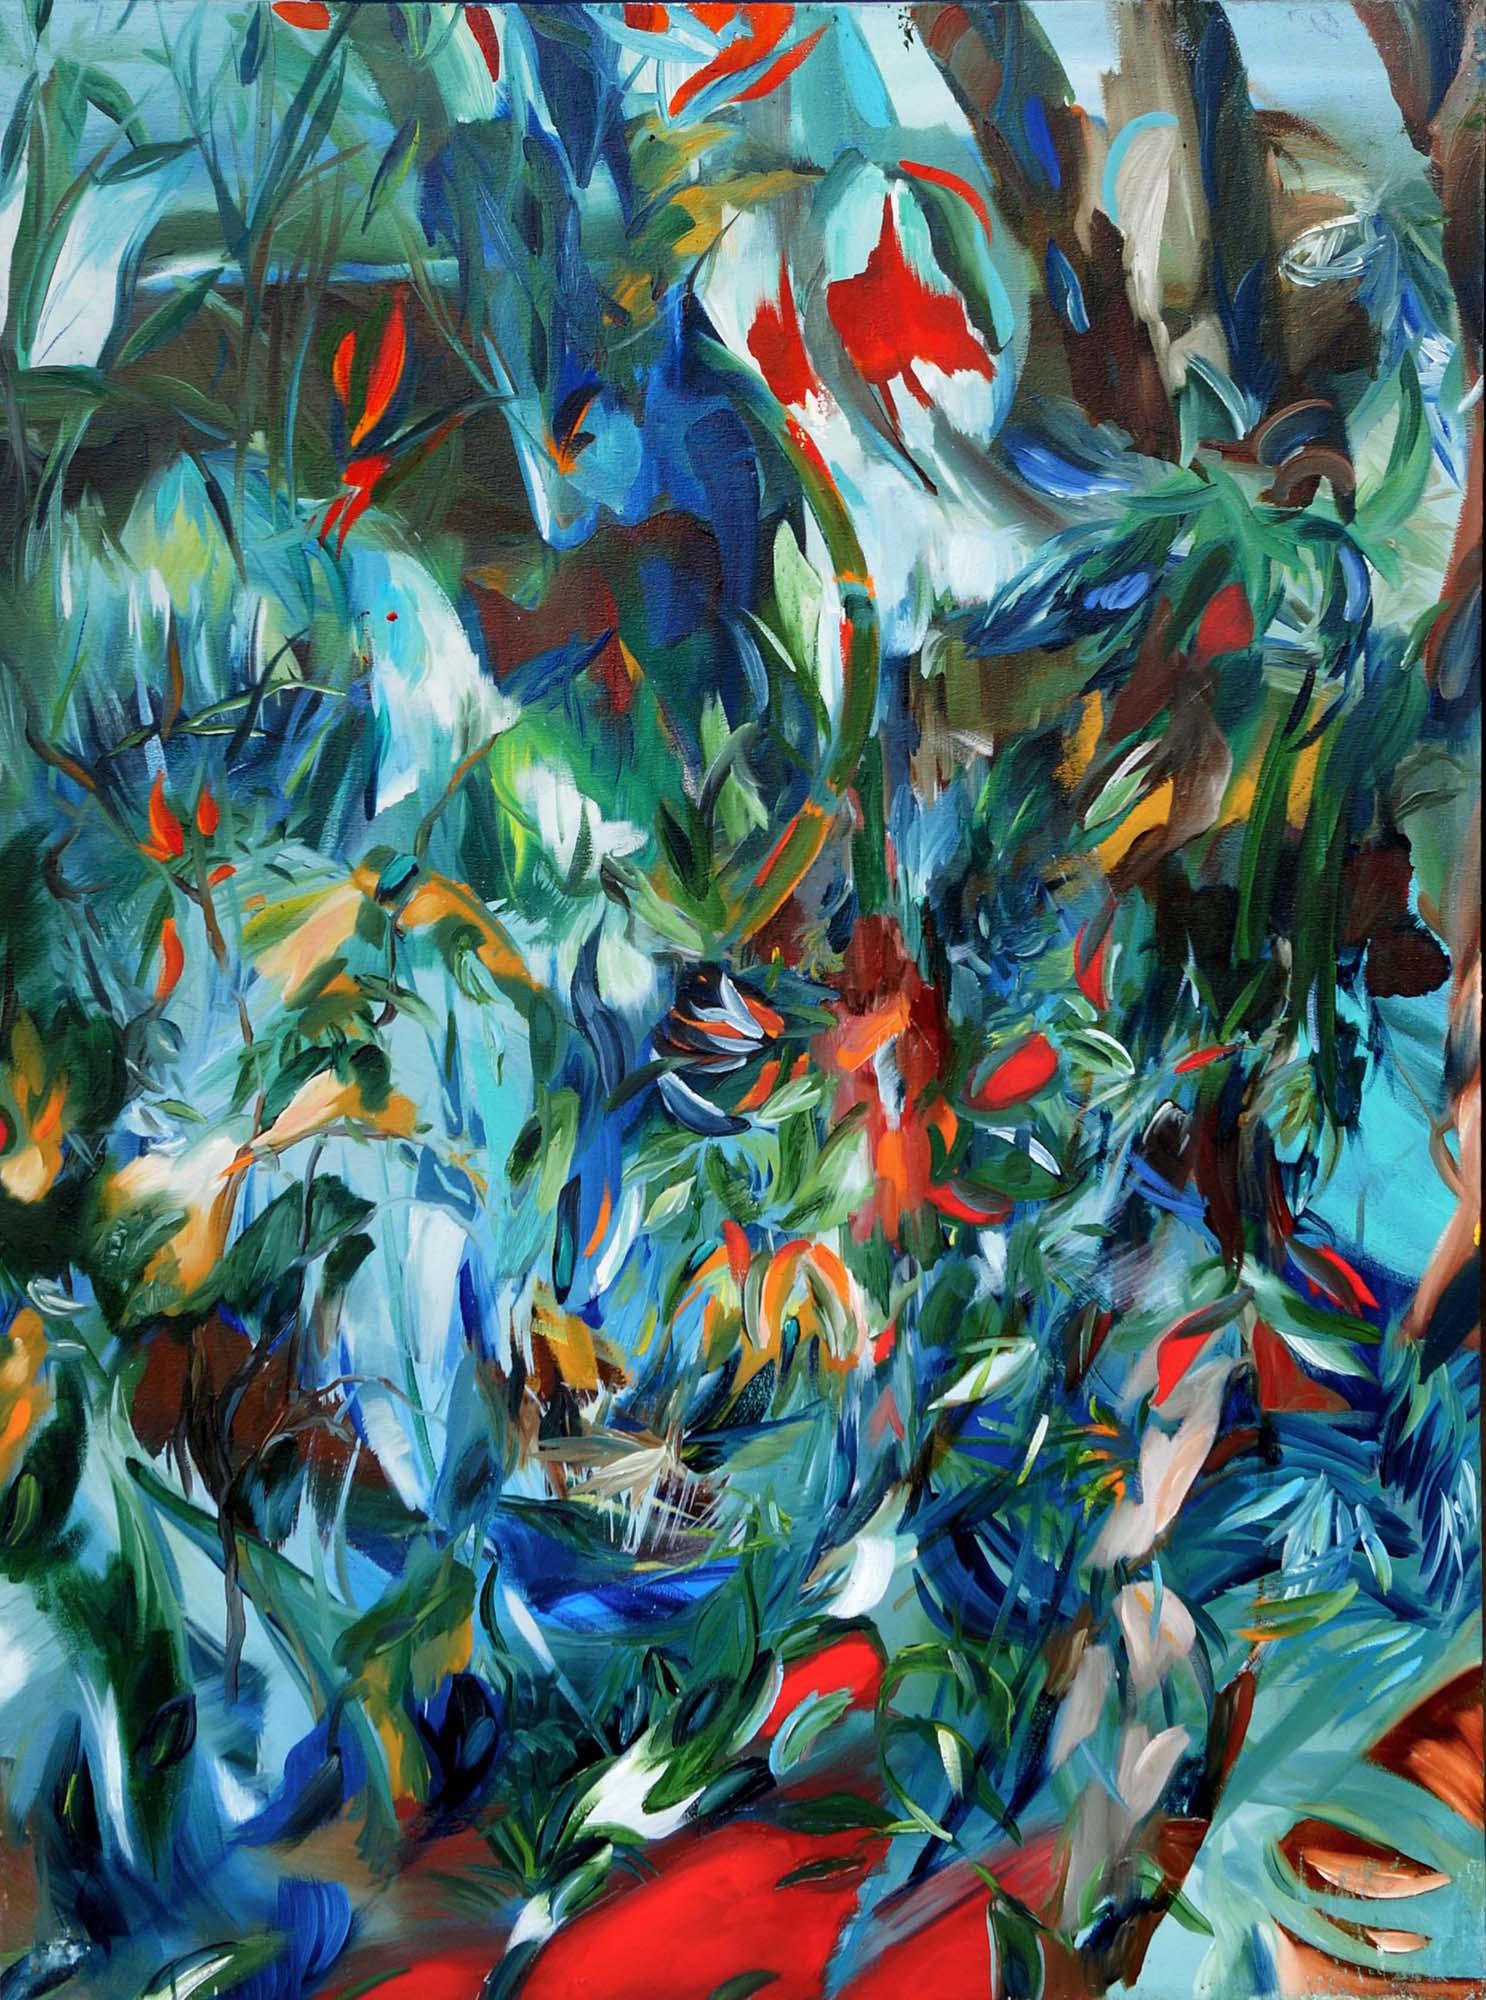 Barbora Chlastakova, Sacret Forest 1, Acrylic on canvas, 100 x 80 cm, 2016